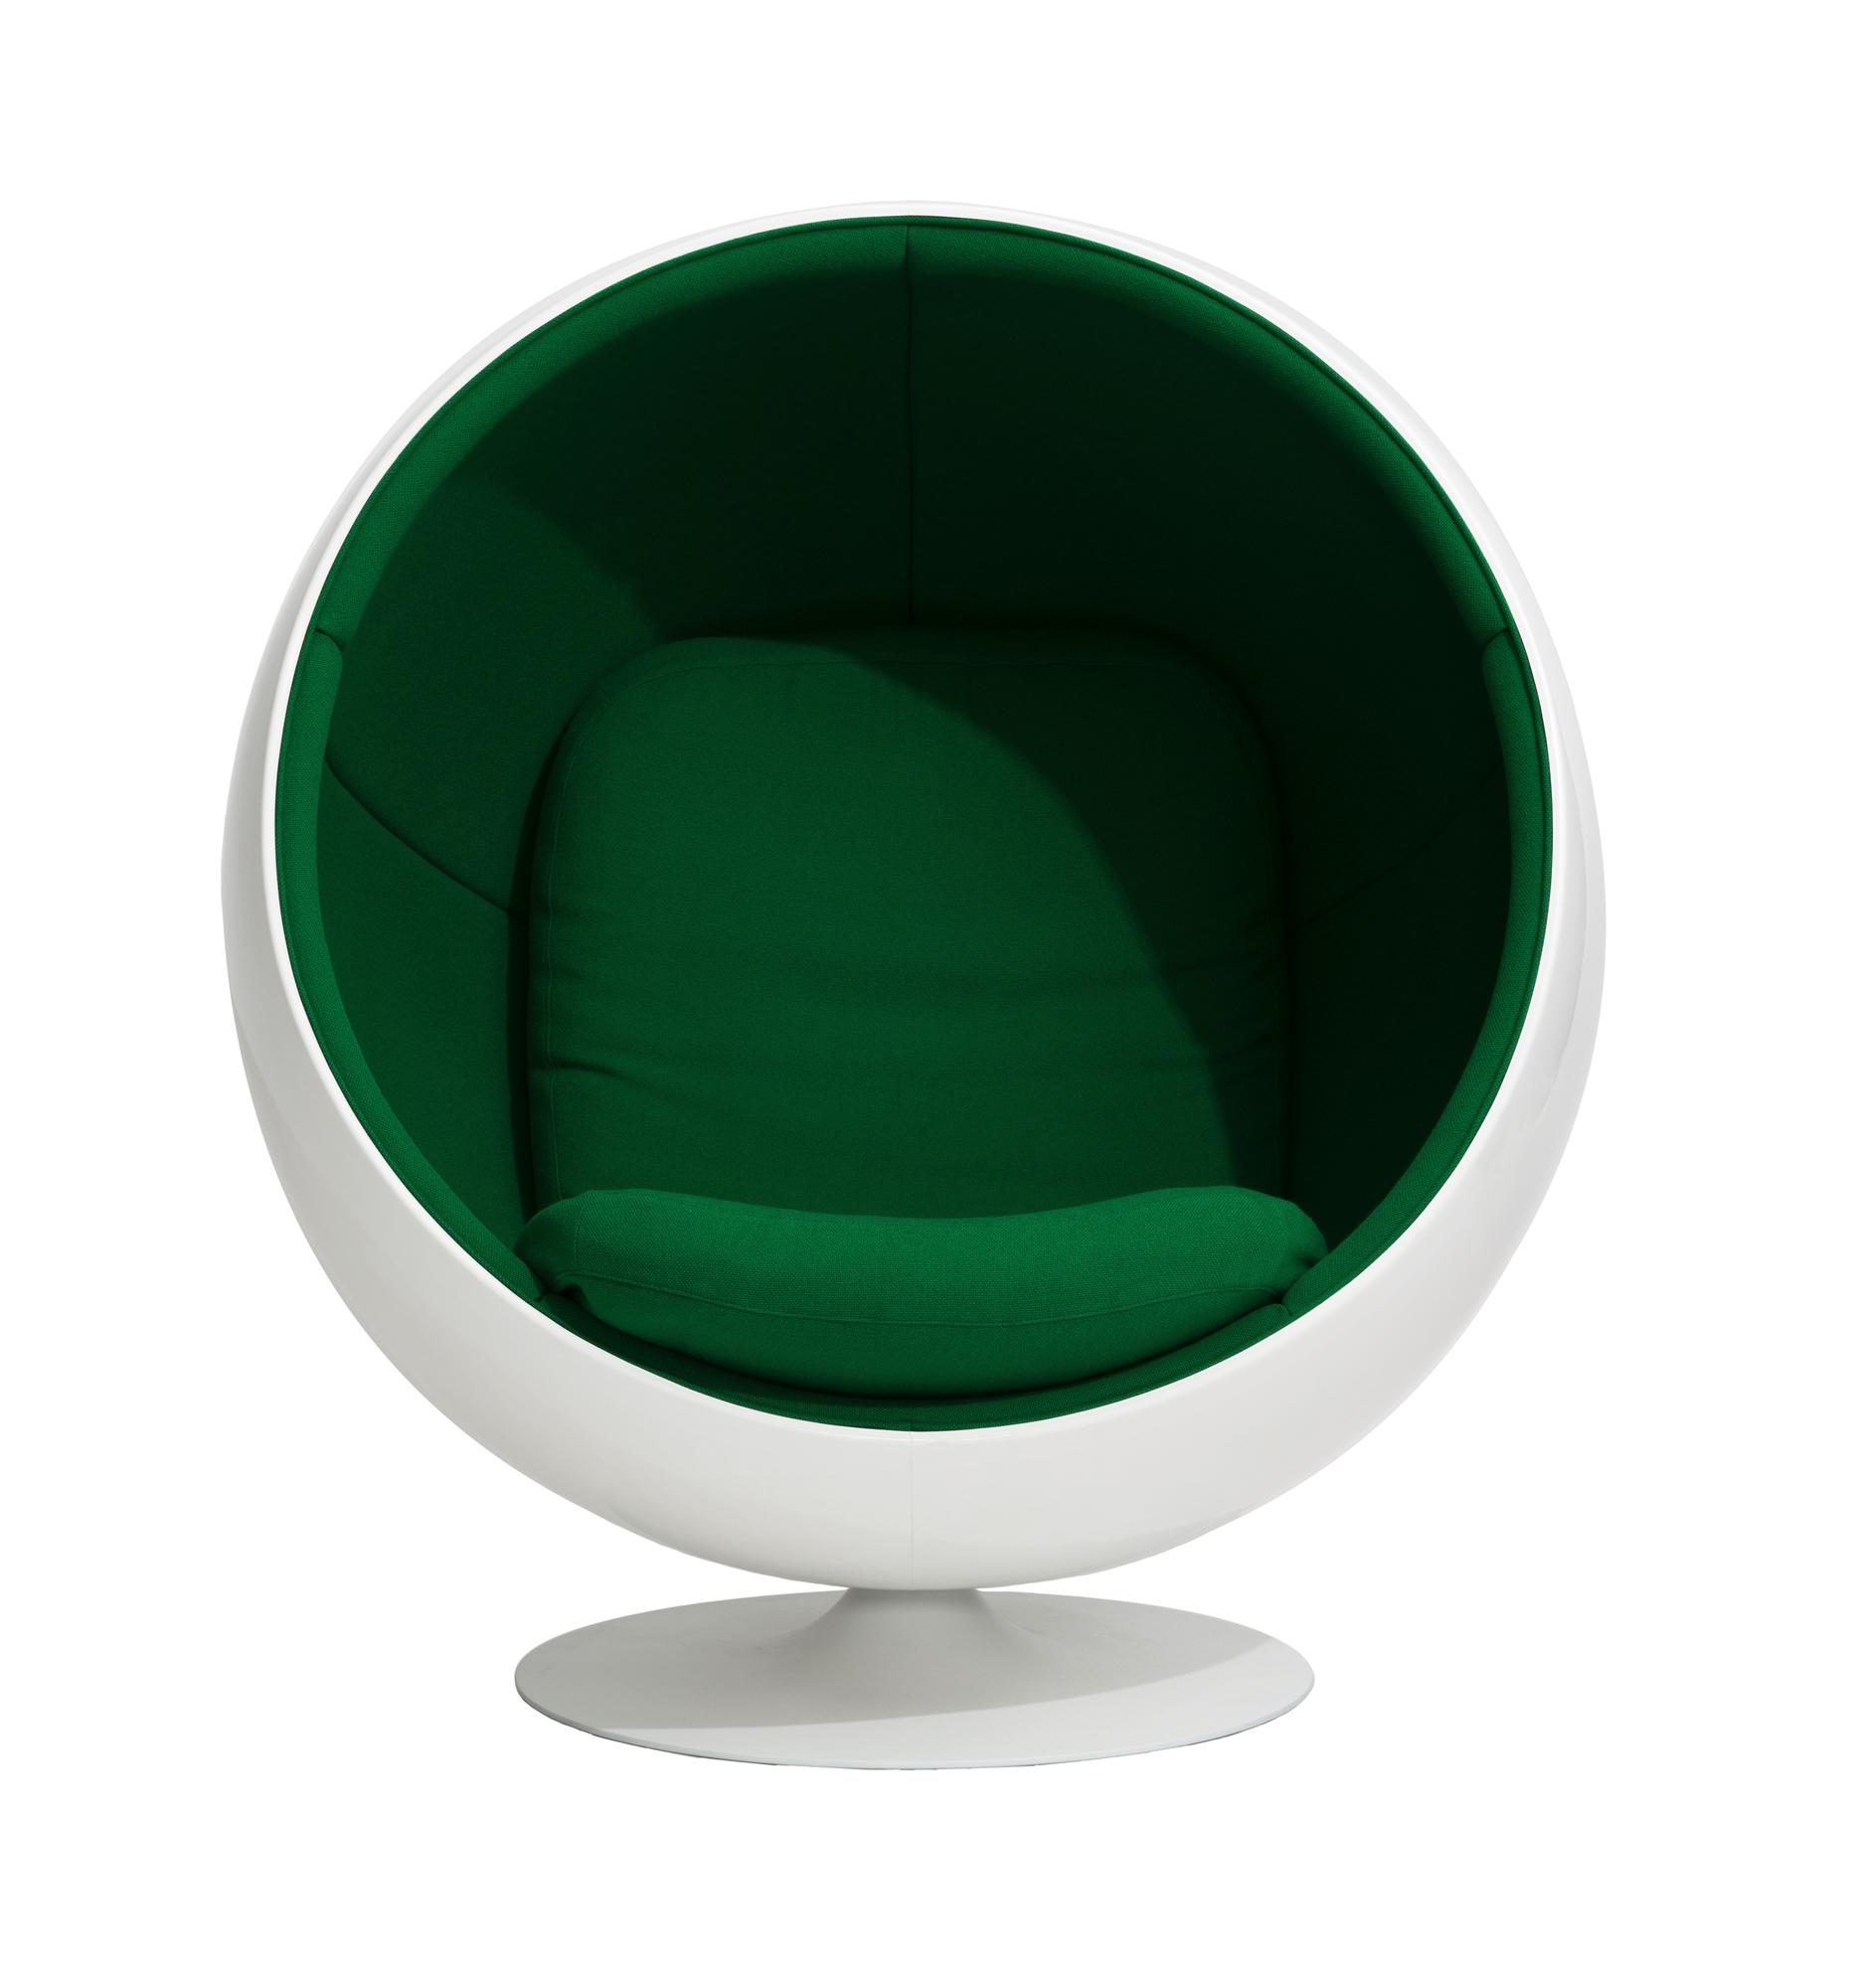 Ball Chair Sessel Hallingdal Blau 753 Eero Aarnio Originals AUSSTELLUNGSSTÜCK